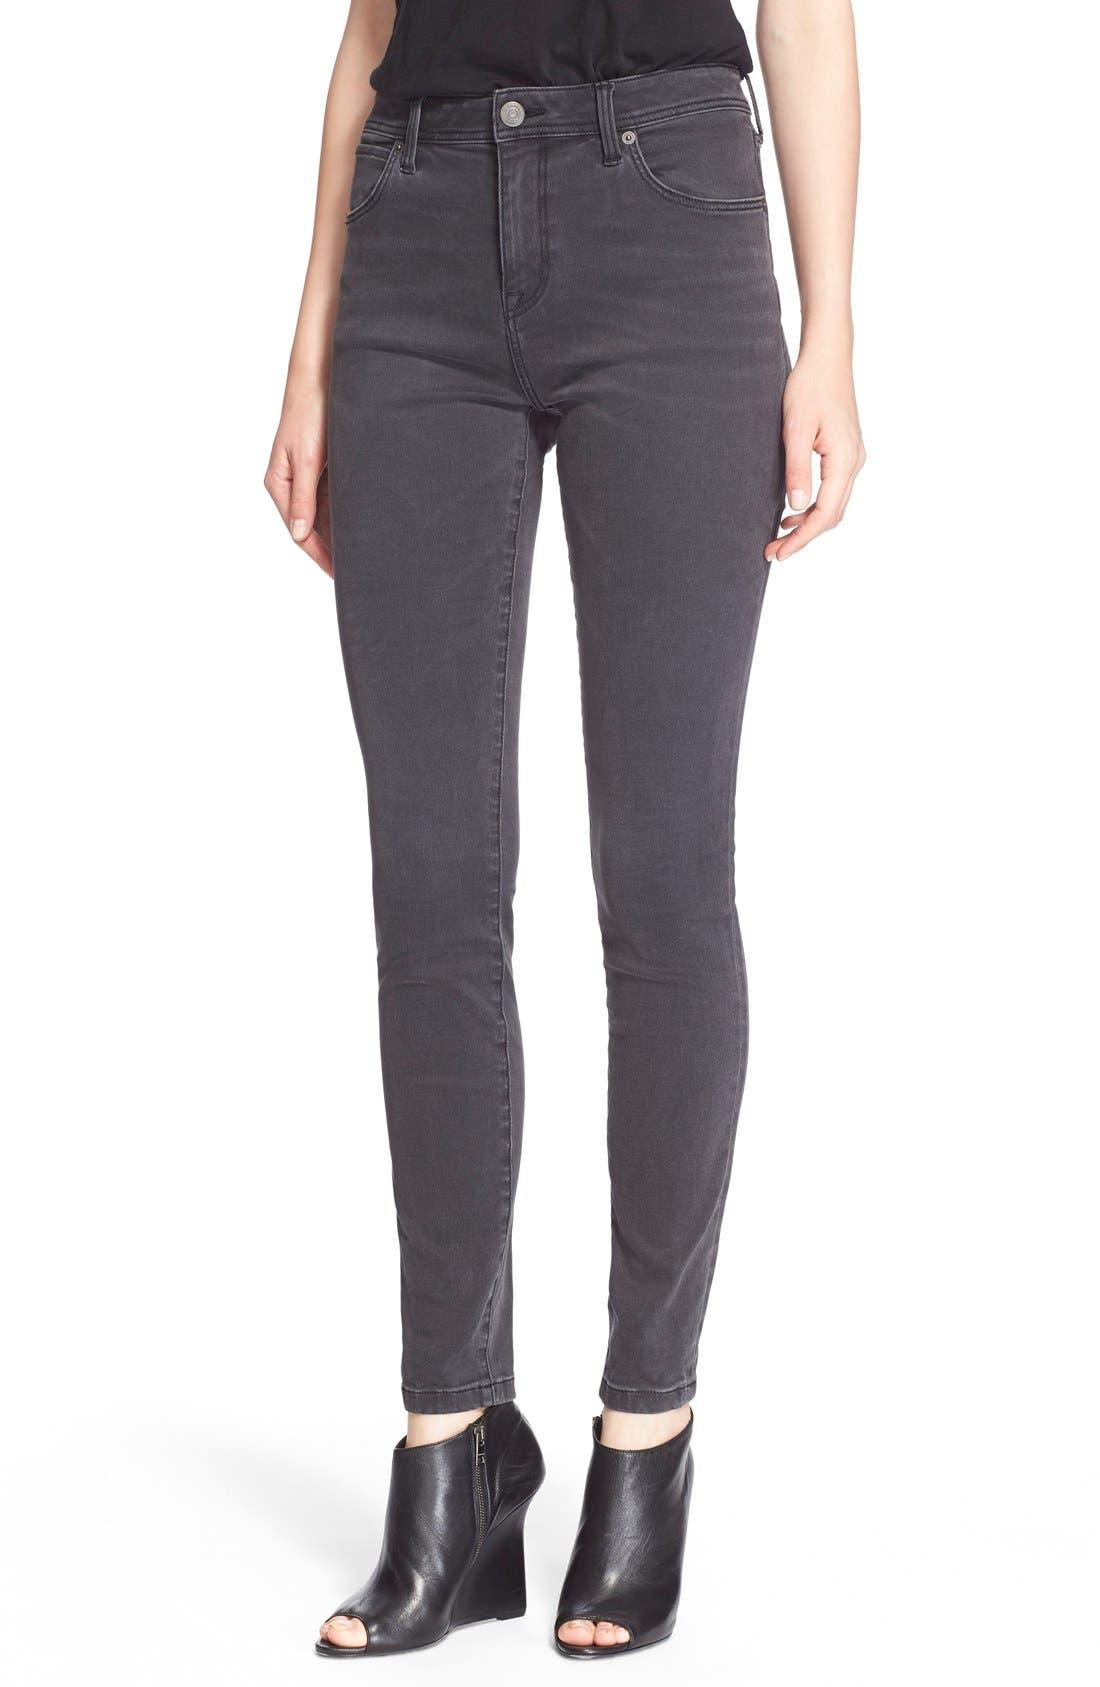 Alternate Image 1 Selected - Burberry Brit Skinny Jeans (Mid Grey)